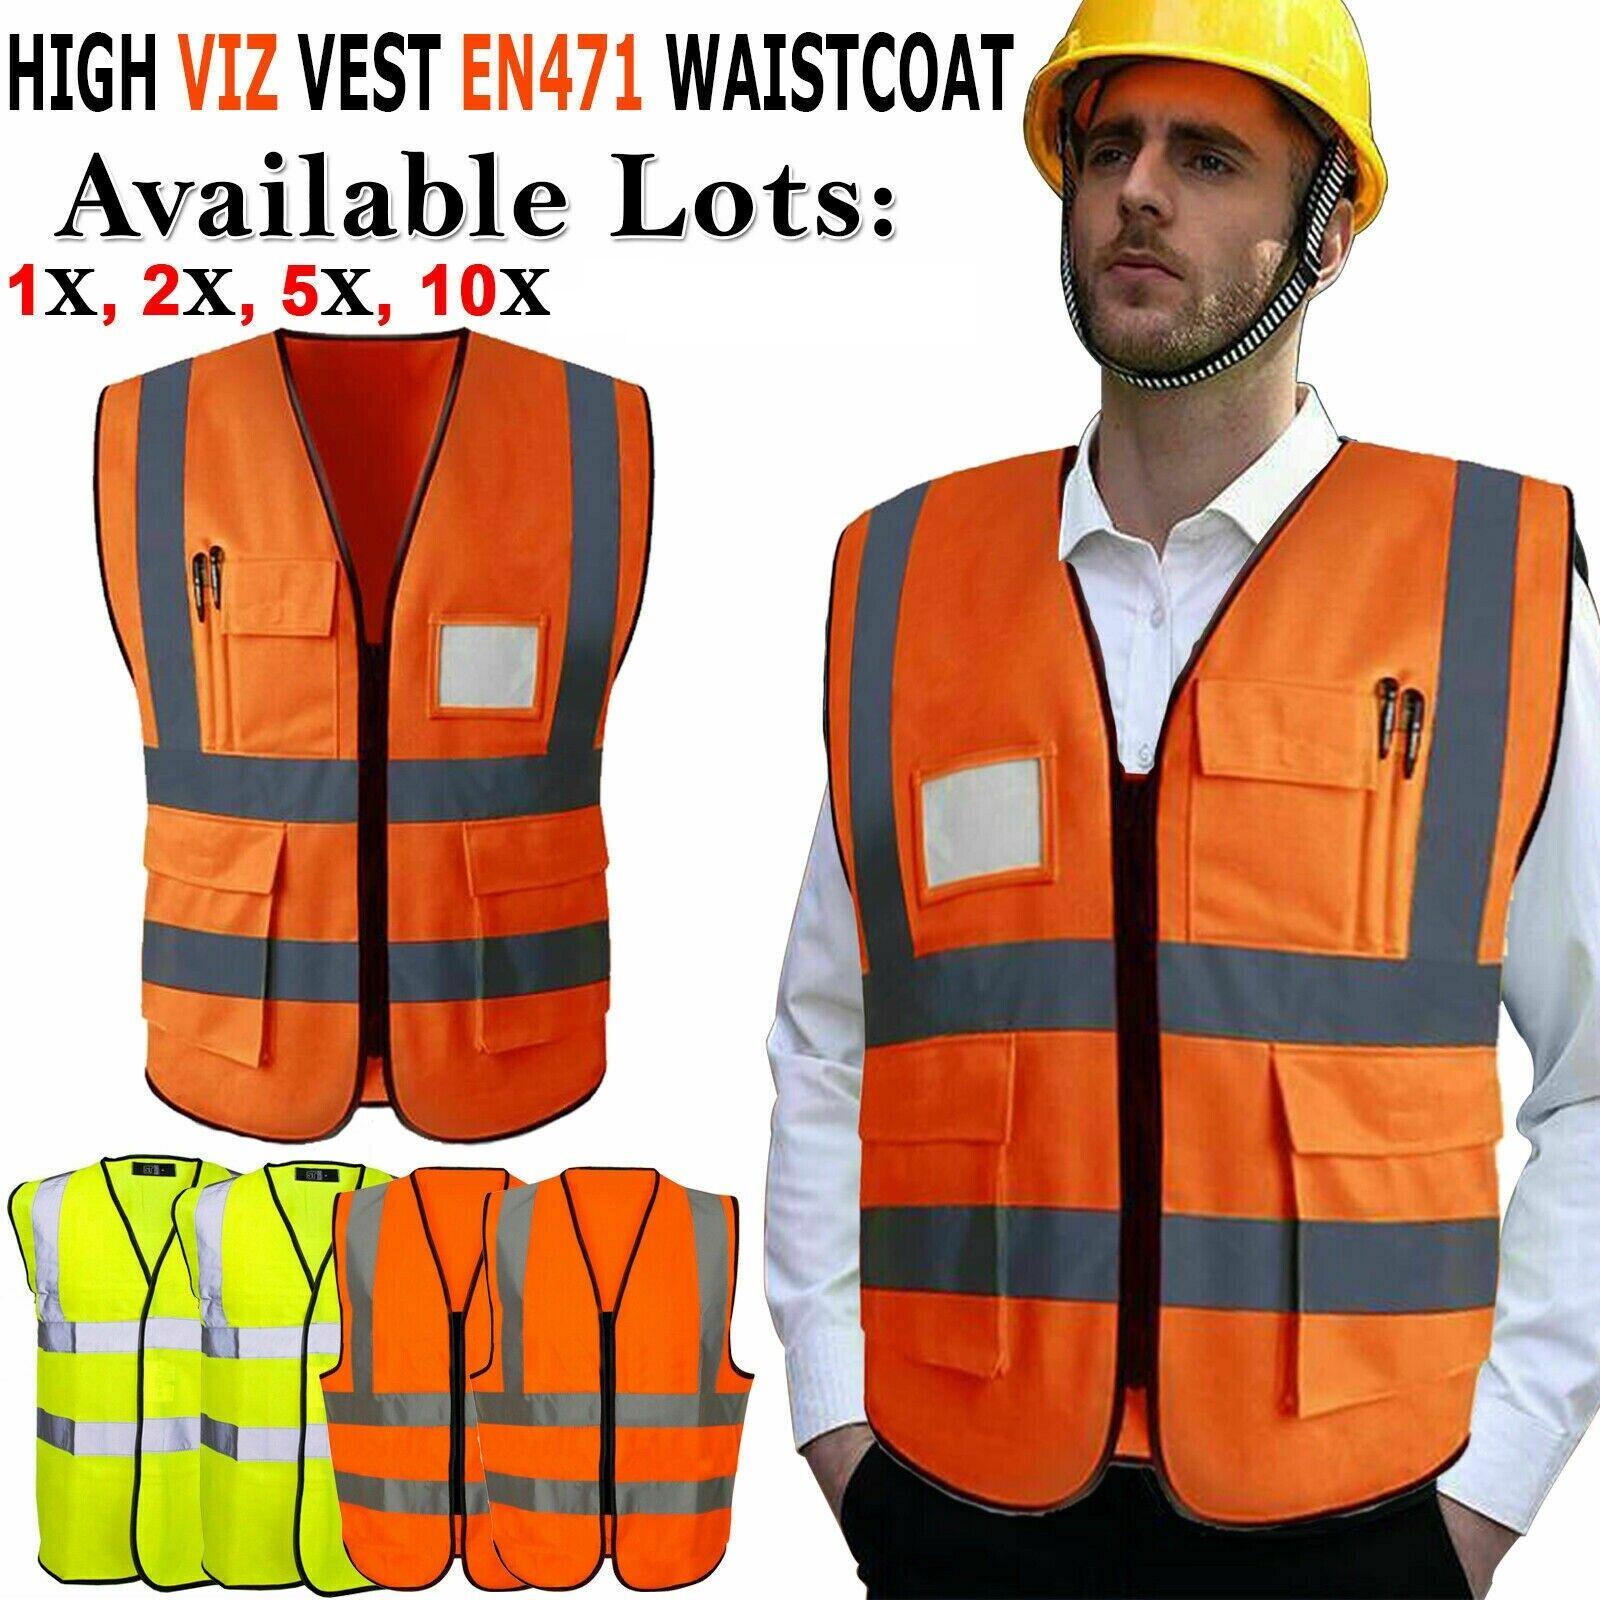 Hi-Vis Vest High Vis Safety EN471 Reflective Waistcoat Visibility Jacket Cycling